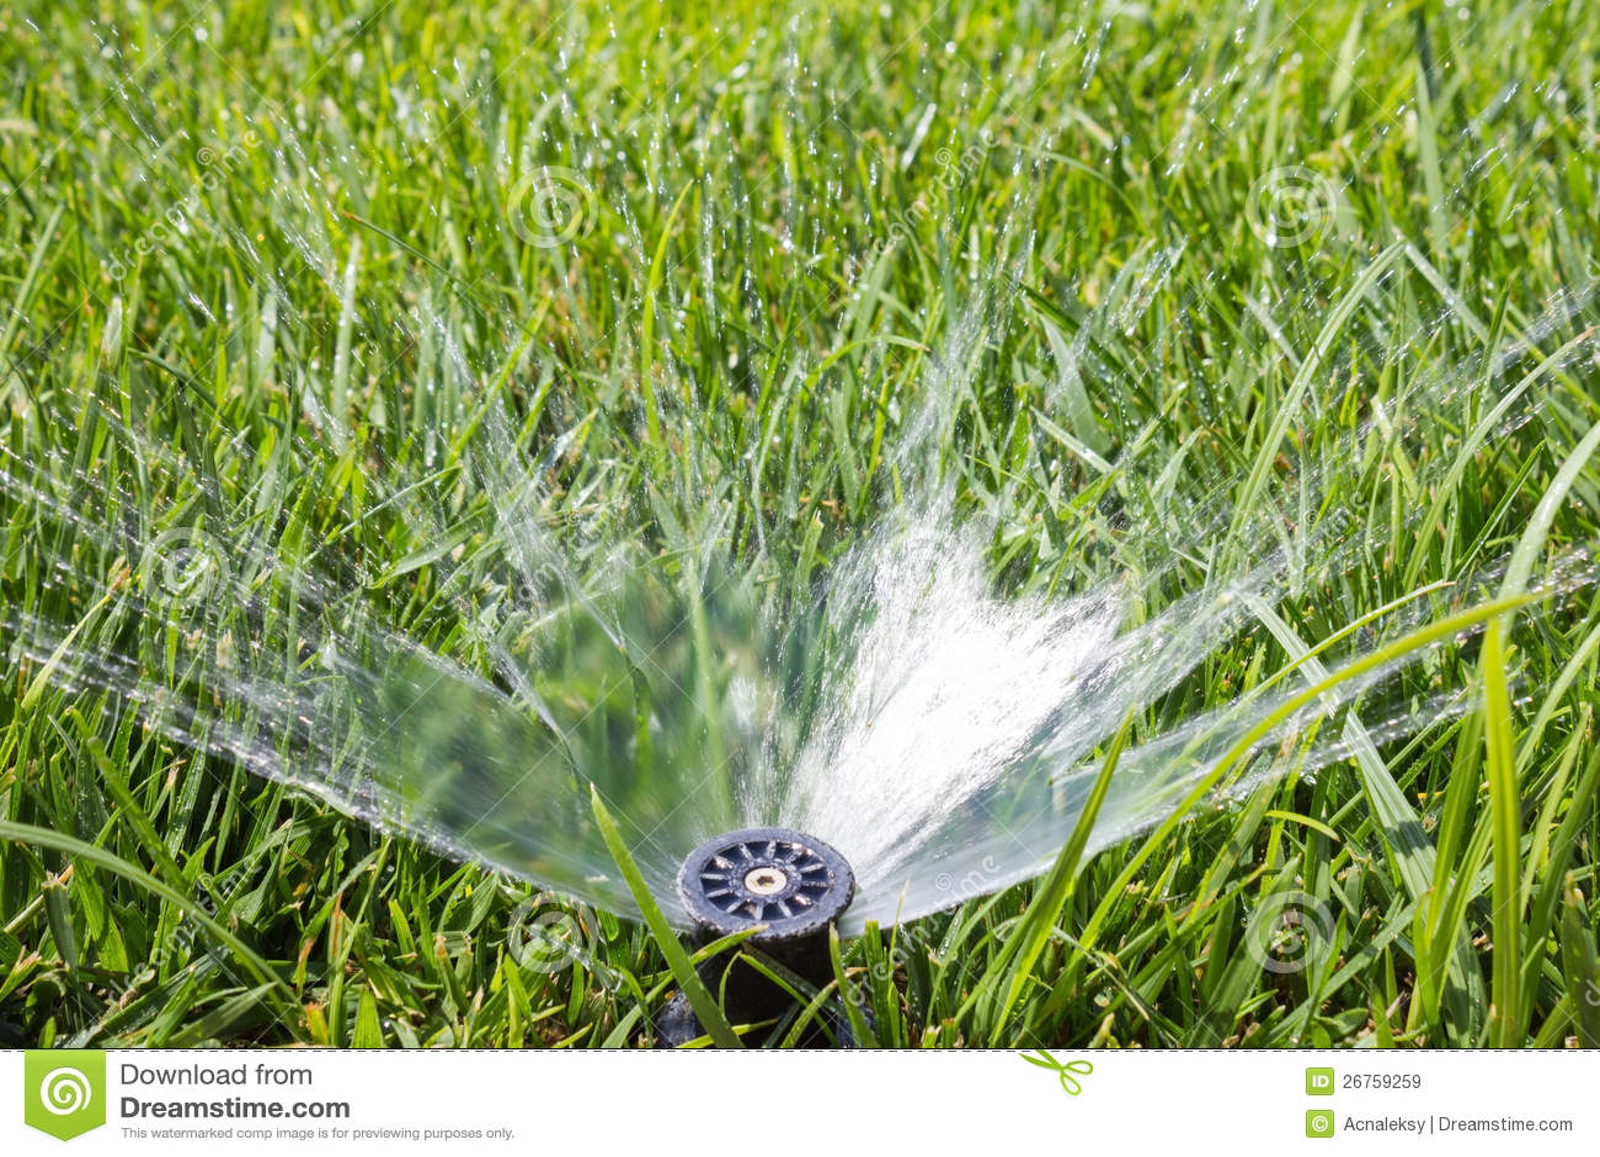 Garden Sprinkler Royalty Free Stock Images Image 26759259